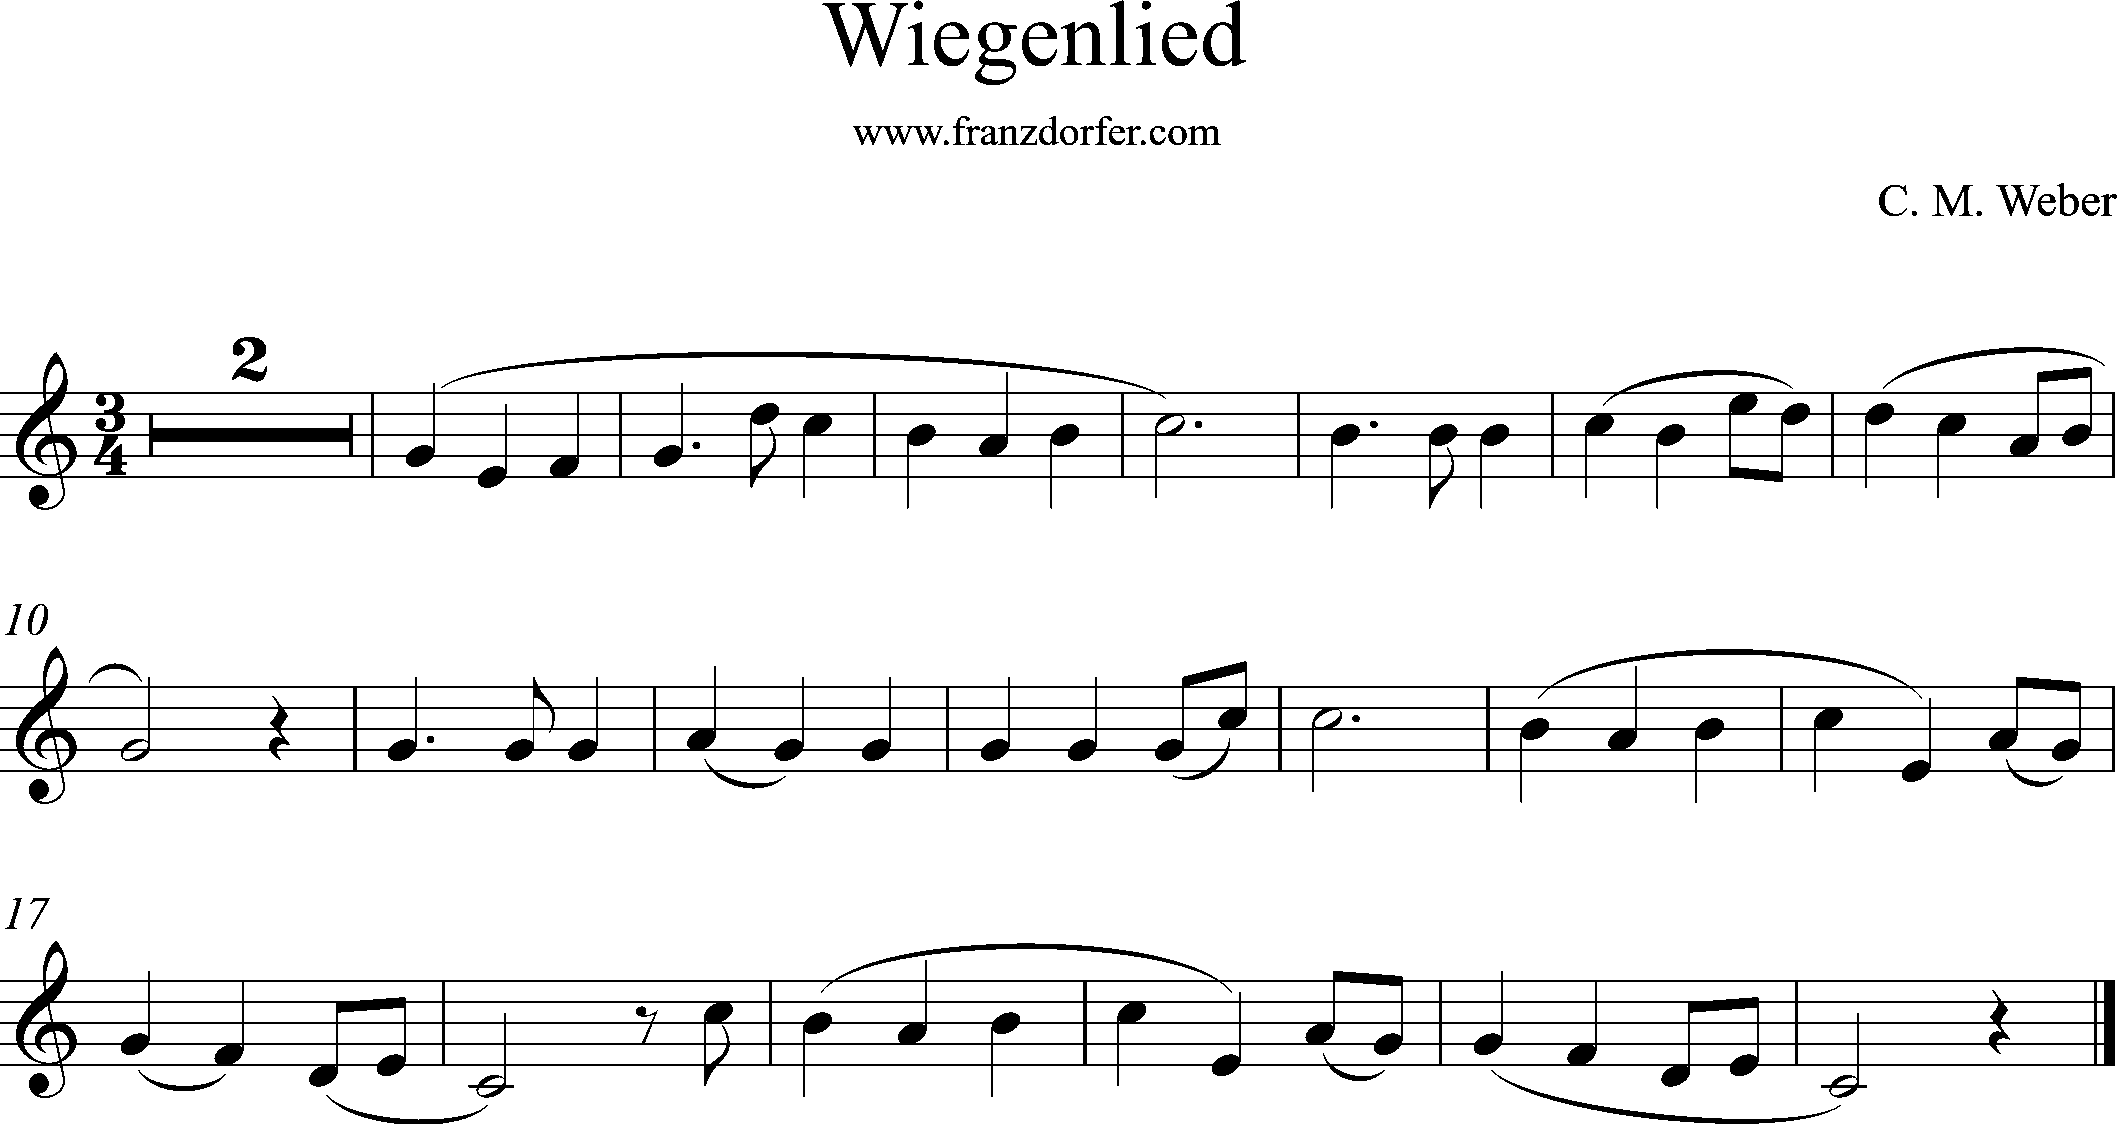 Clarinet sheetmusic, Cradlw song, Weber